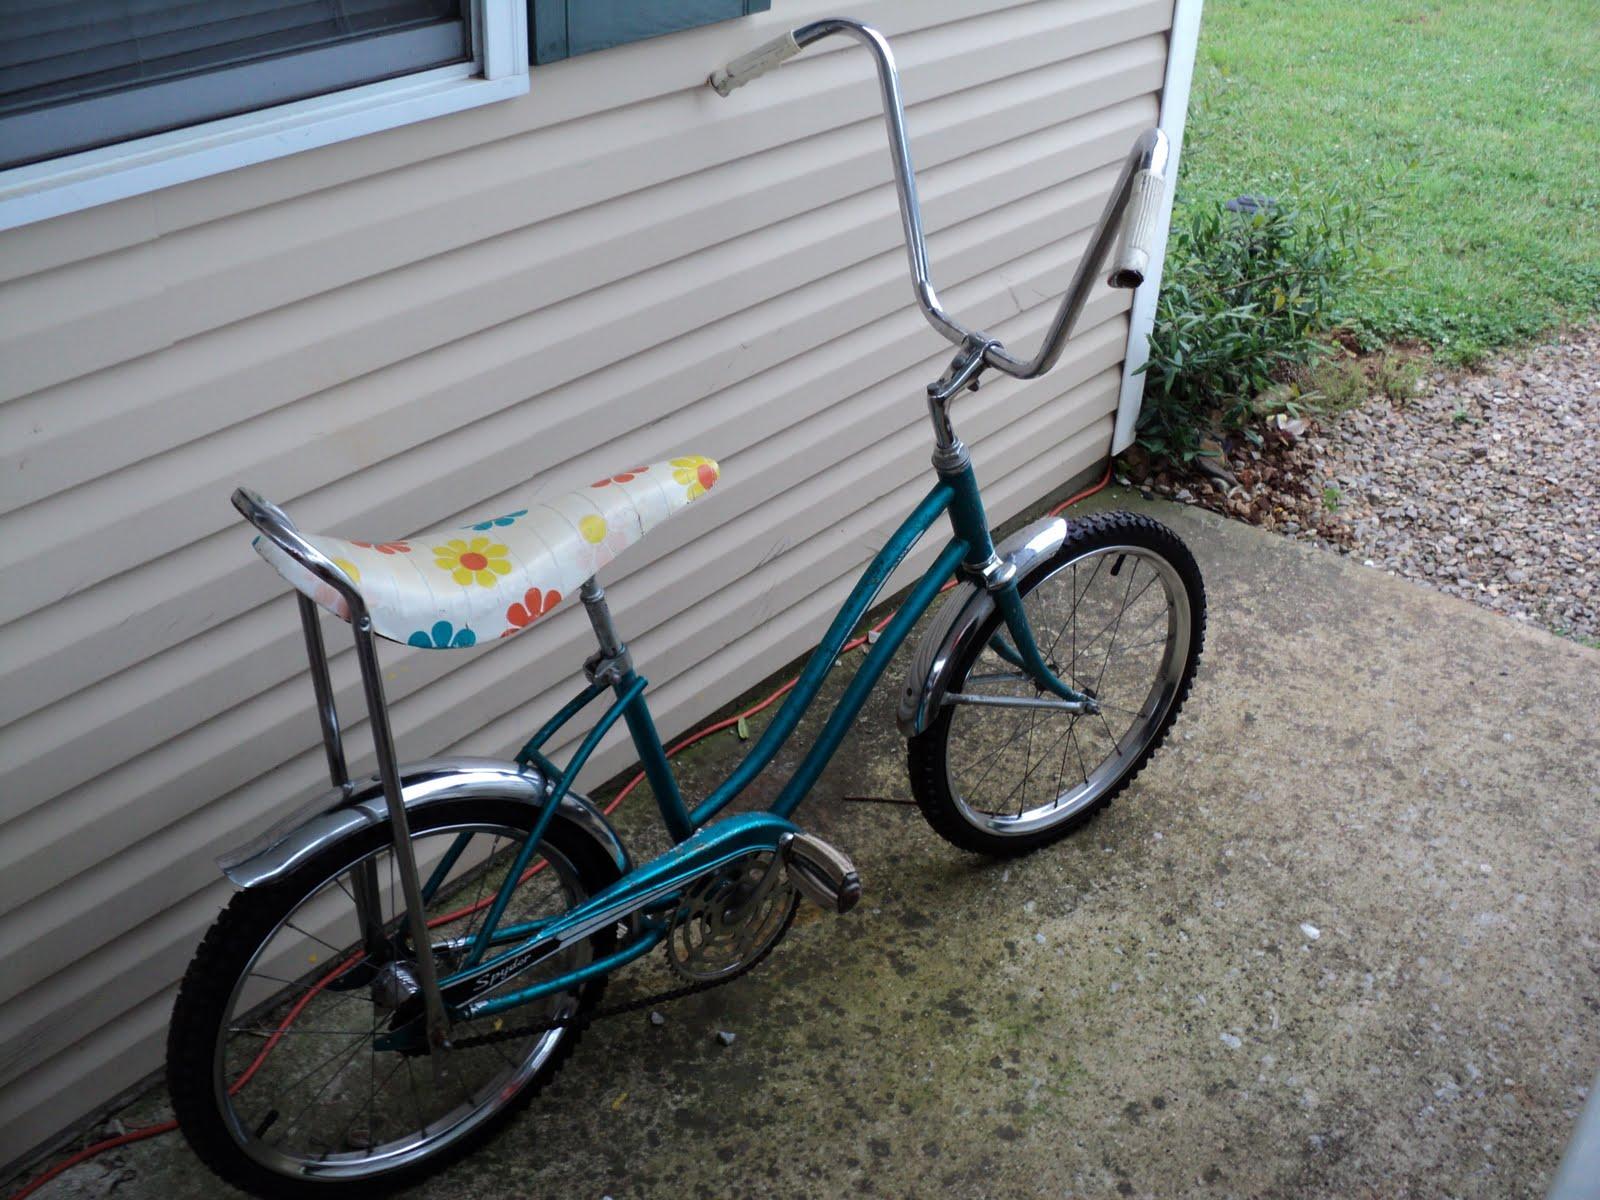 Jason S List 1969 Sear Spyder Banana Seat Muscle Bike 4 Sale